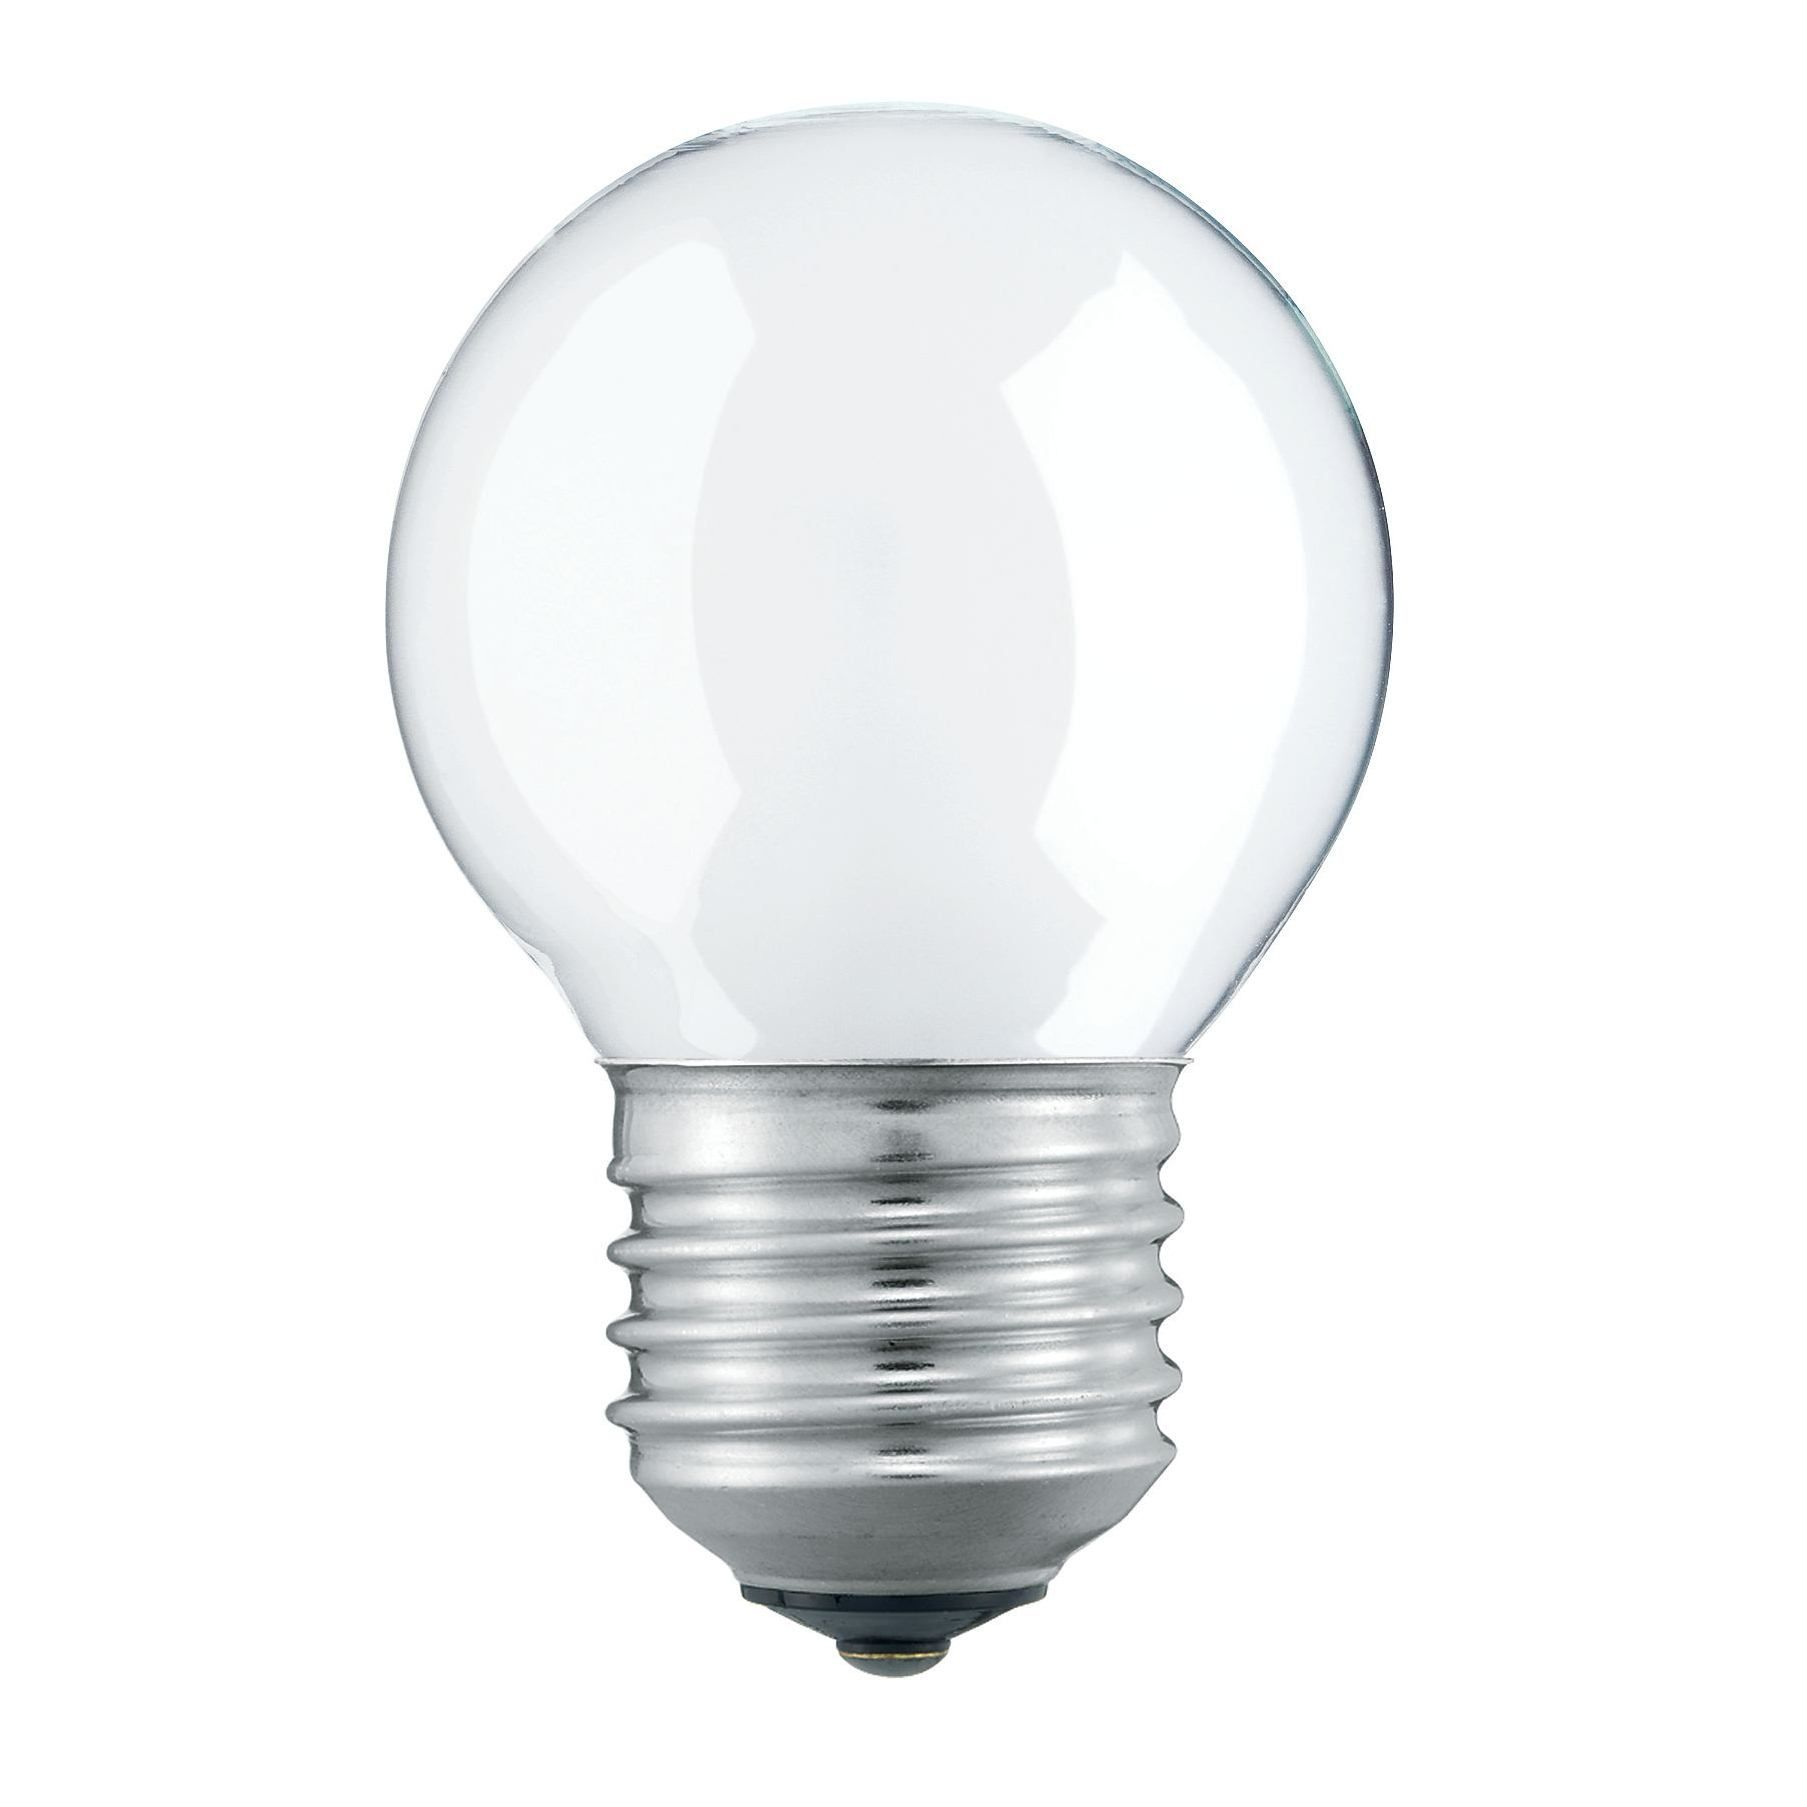 Купить Лампа накаливания Philips Stan 60W E27 230V P45 FR 1CT/10X10F матовая